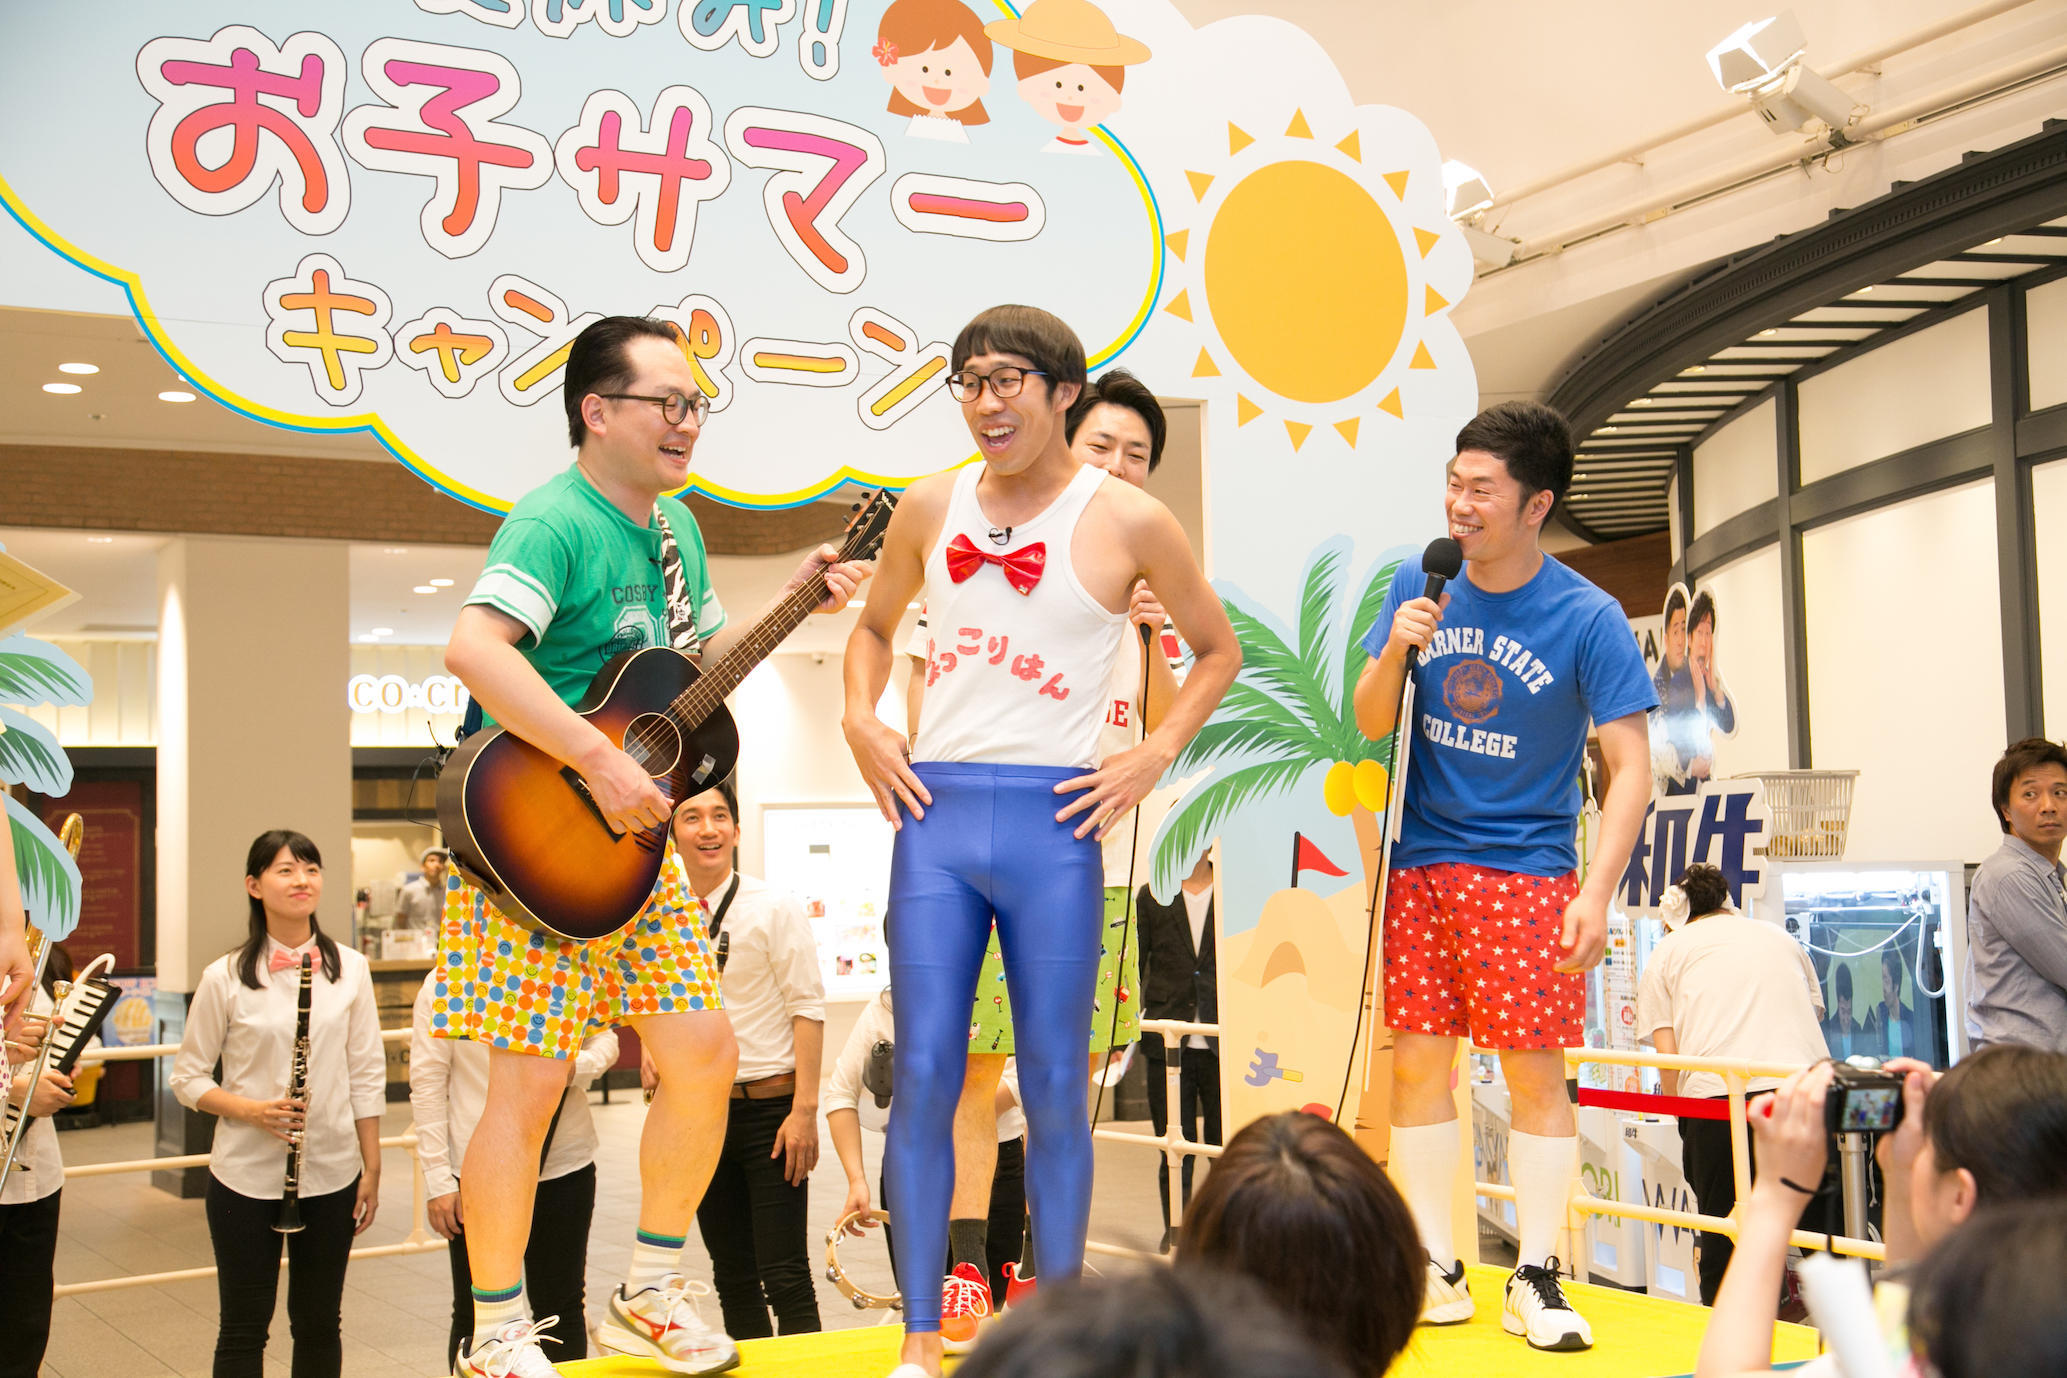 http://news.yoshimoto.co.jp/20180717223709-8fa9d3211f95cfbccfe92a6223a446bc407fd29d.jpg